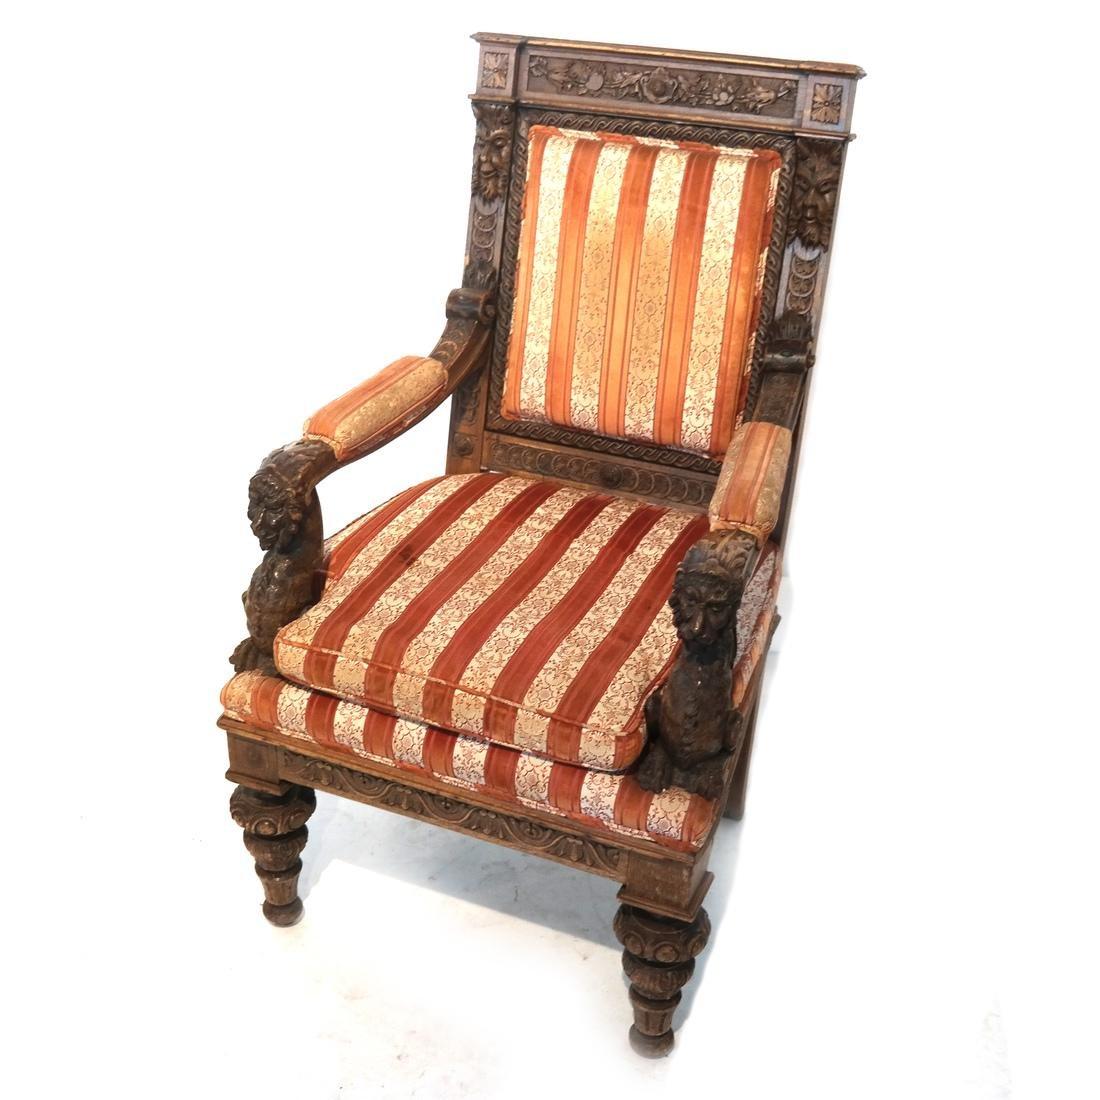 Antique Ornate English Oak Armchair